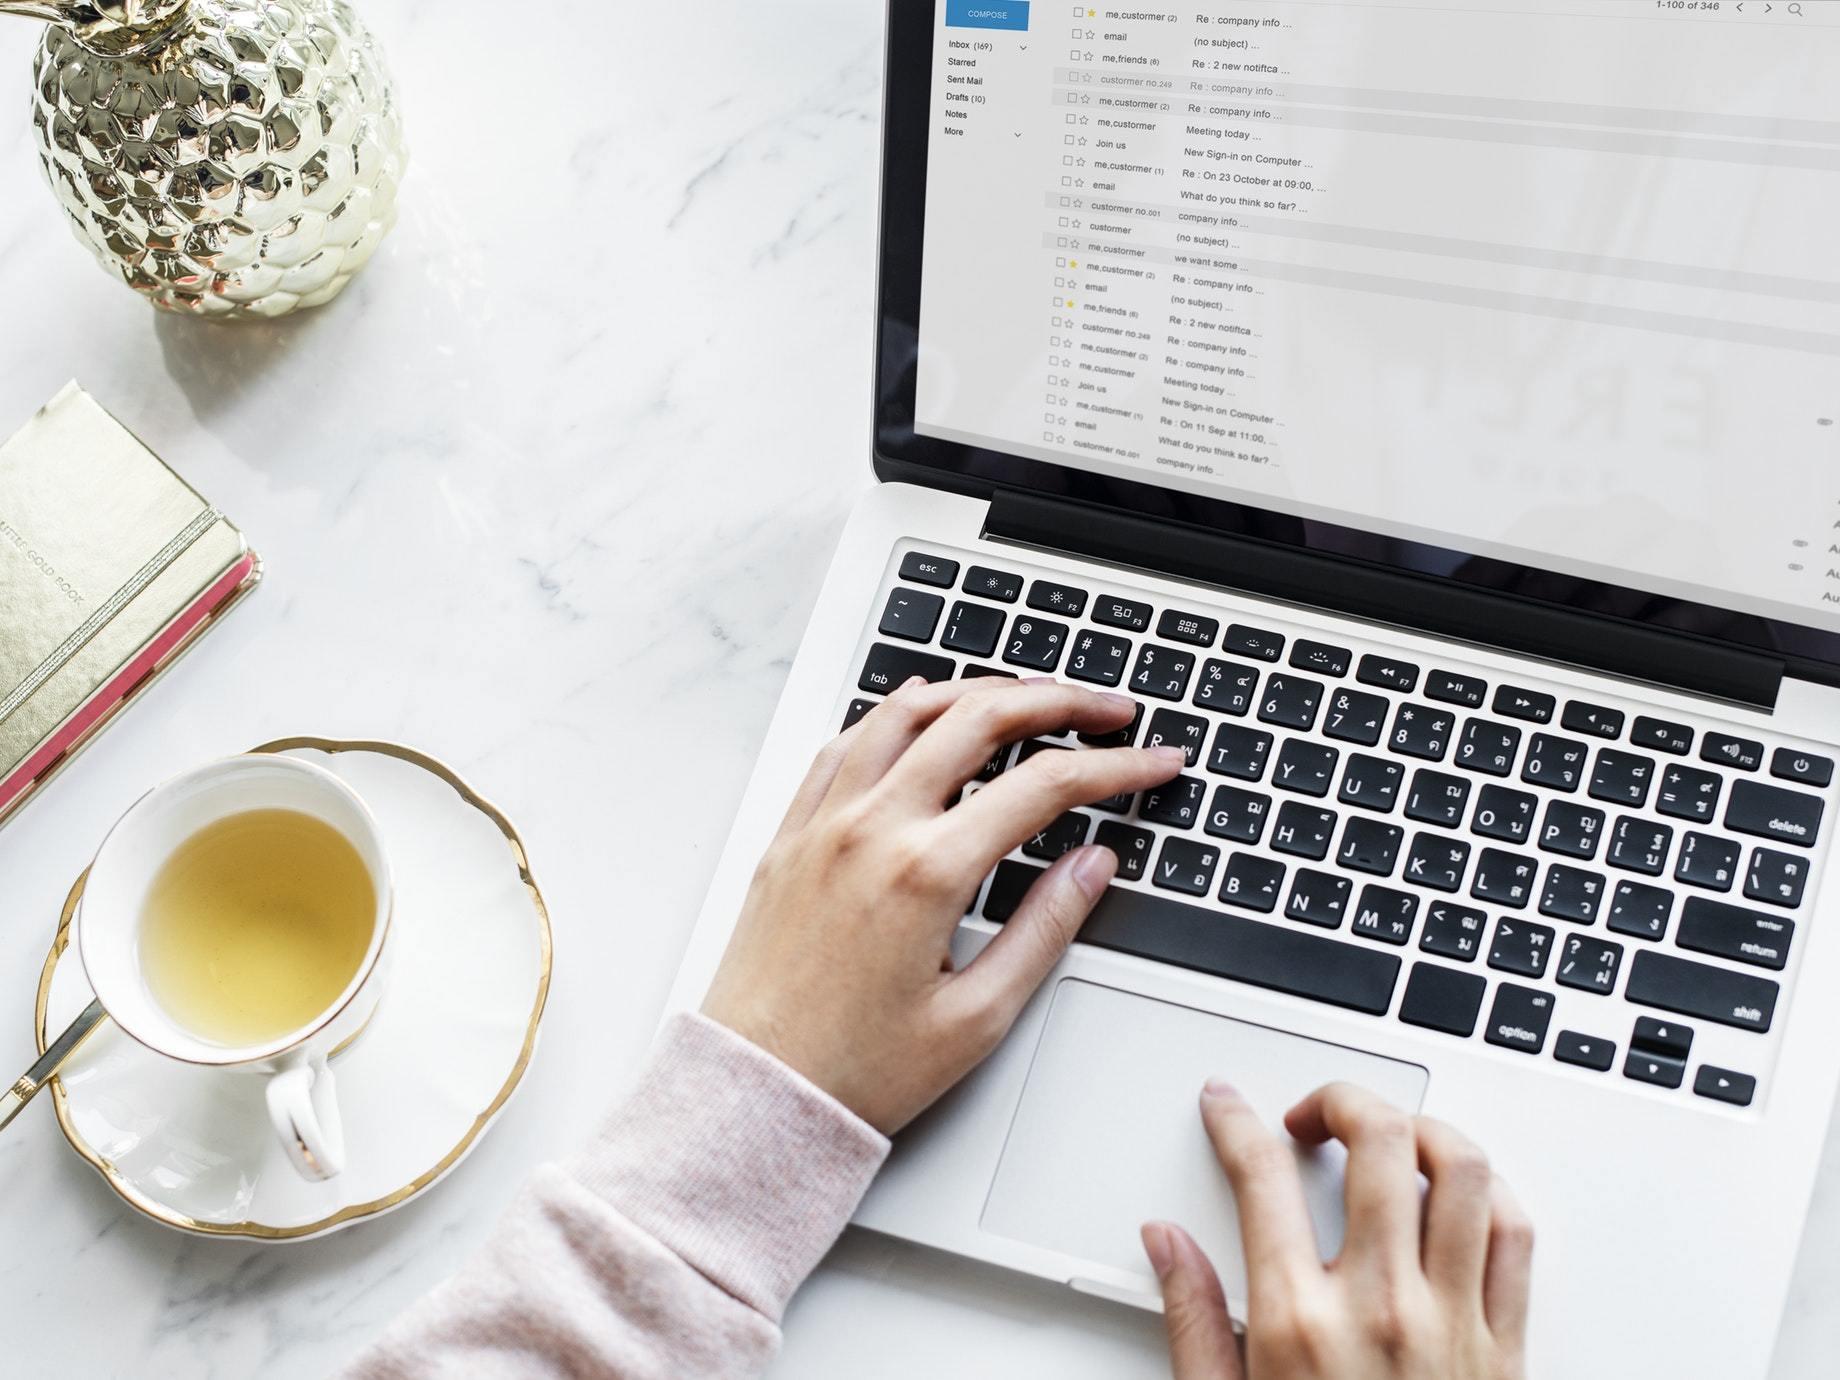 B2B電子報行銷必學的5招:讓你不打擾人,又能輕鬆開發新客戶